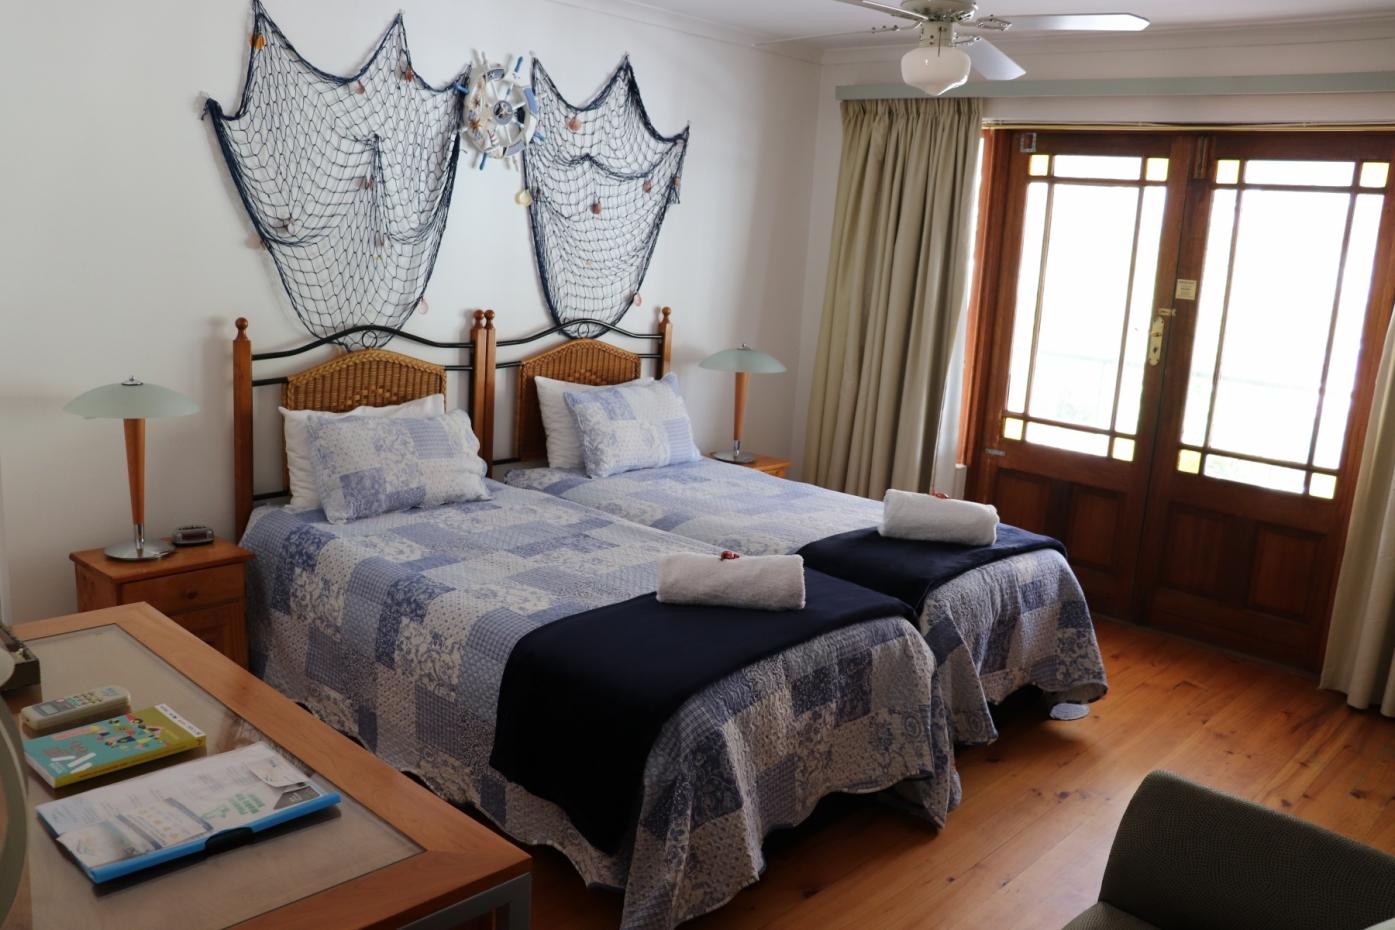 Le Bay LODGE -Rooms